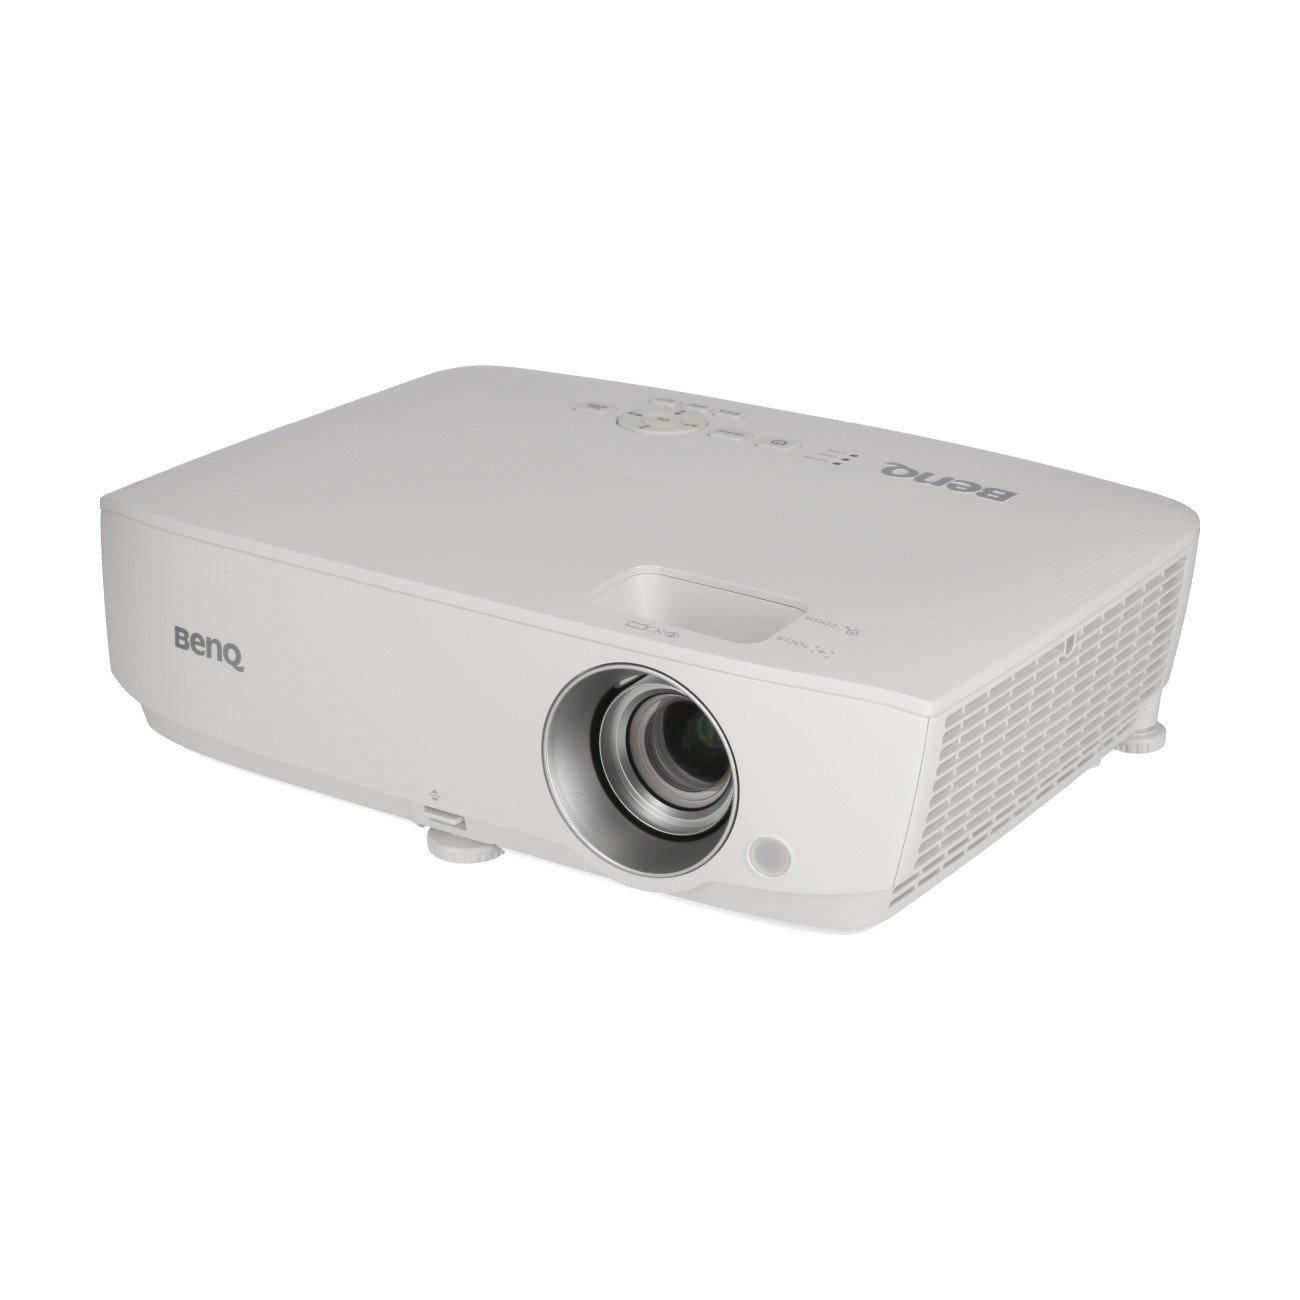 BenQ W1050 Full HD 1080P DLP Home Theater 3D Projector, Short Throw, Rec.709, 2200 Lumens, 1.2X Zoom